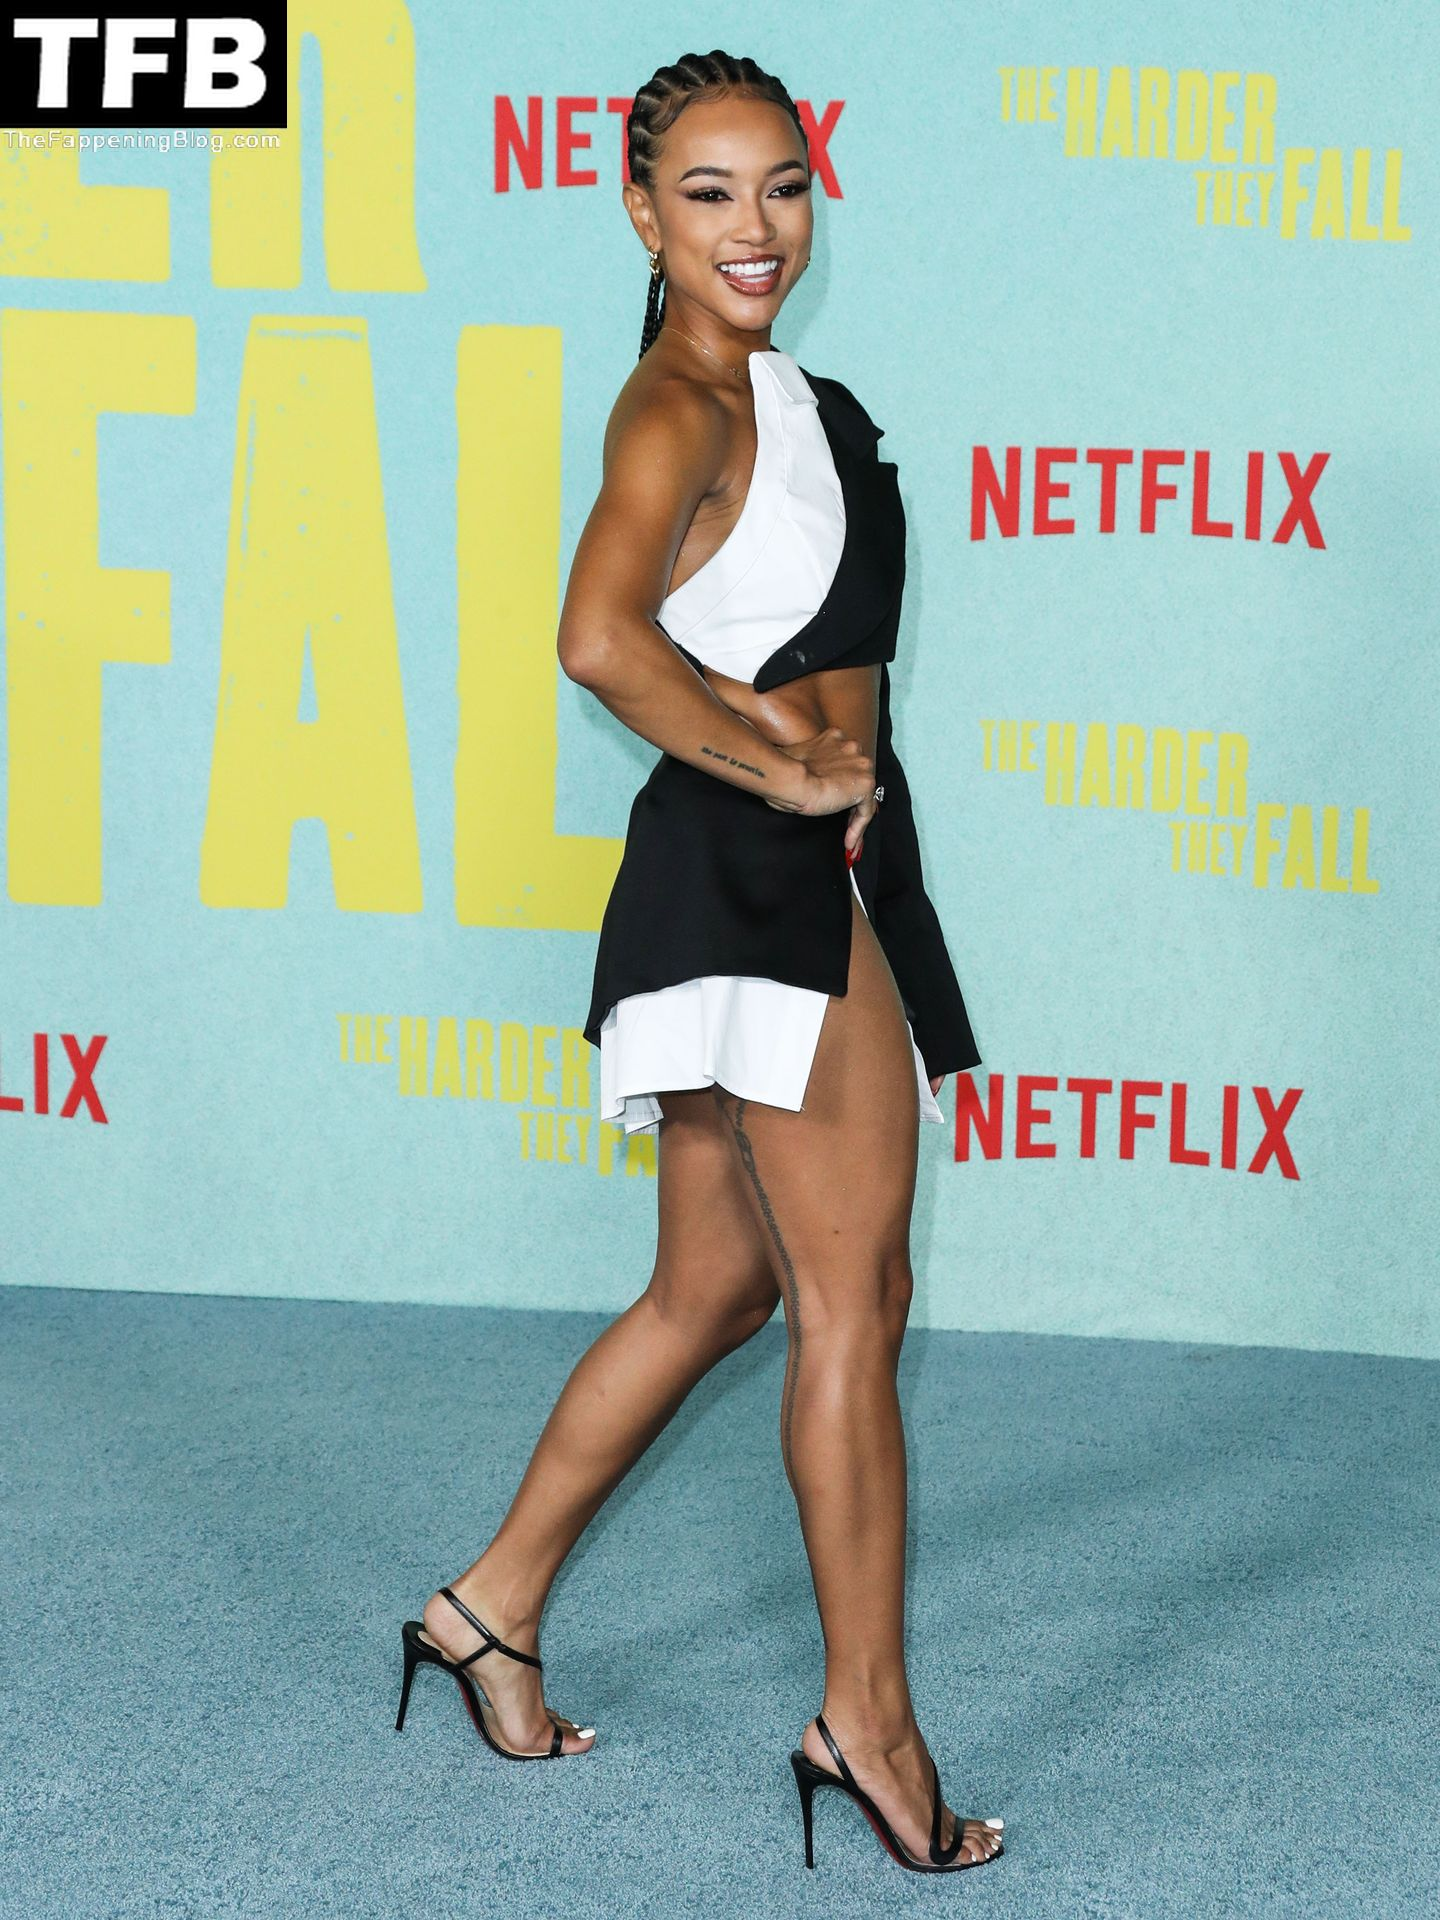 Karrueche-Tran-Sexy-Legs-Upskirt-The-Fappening-Blog-2.jpg